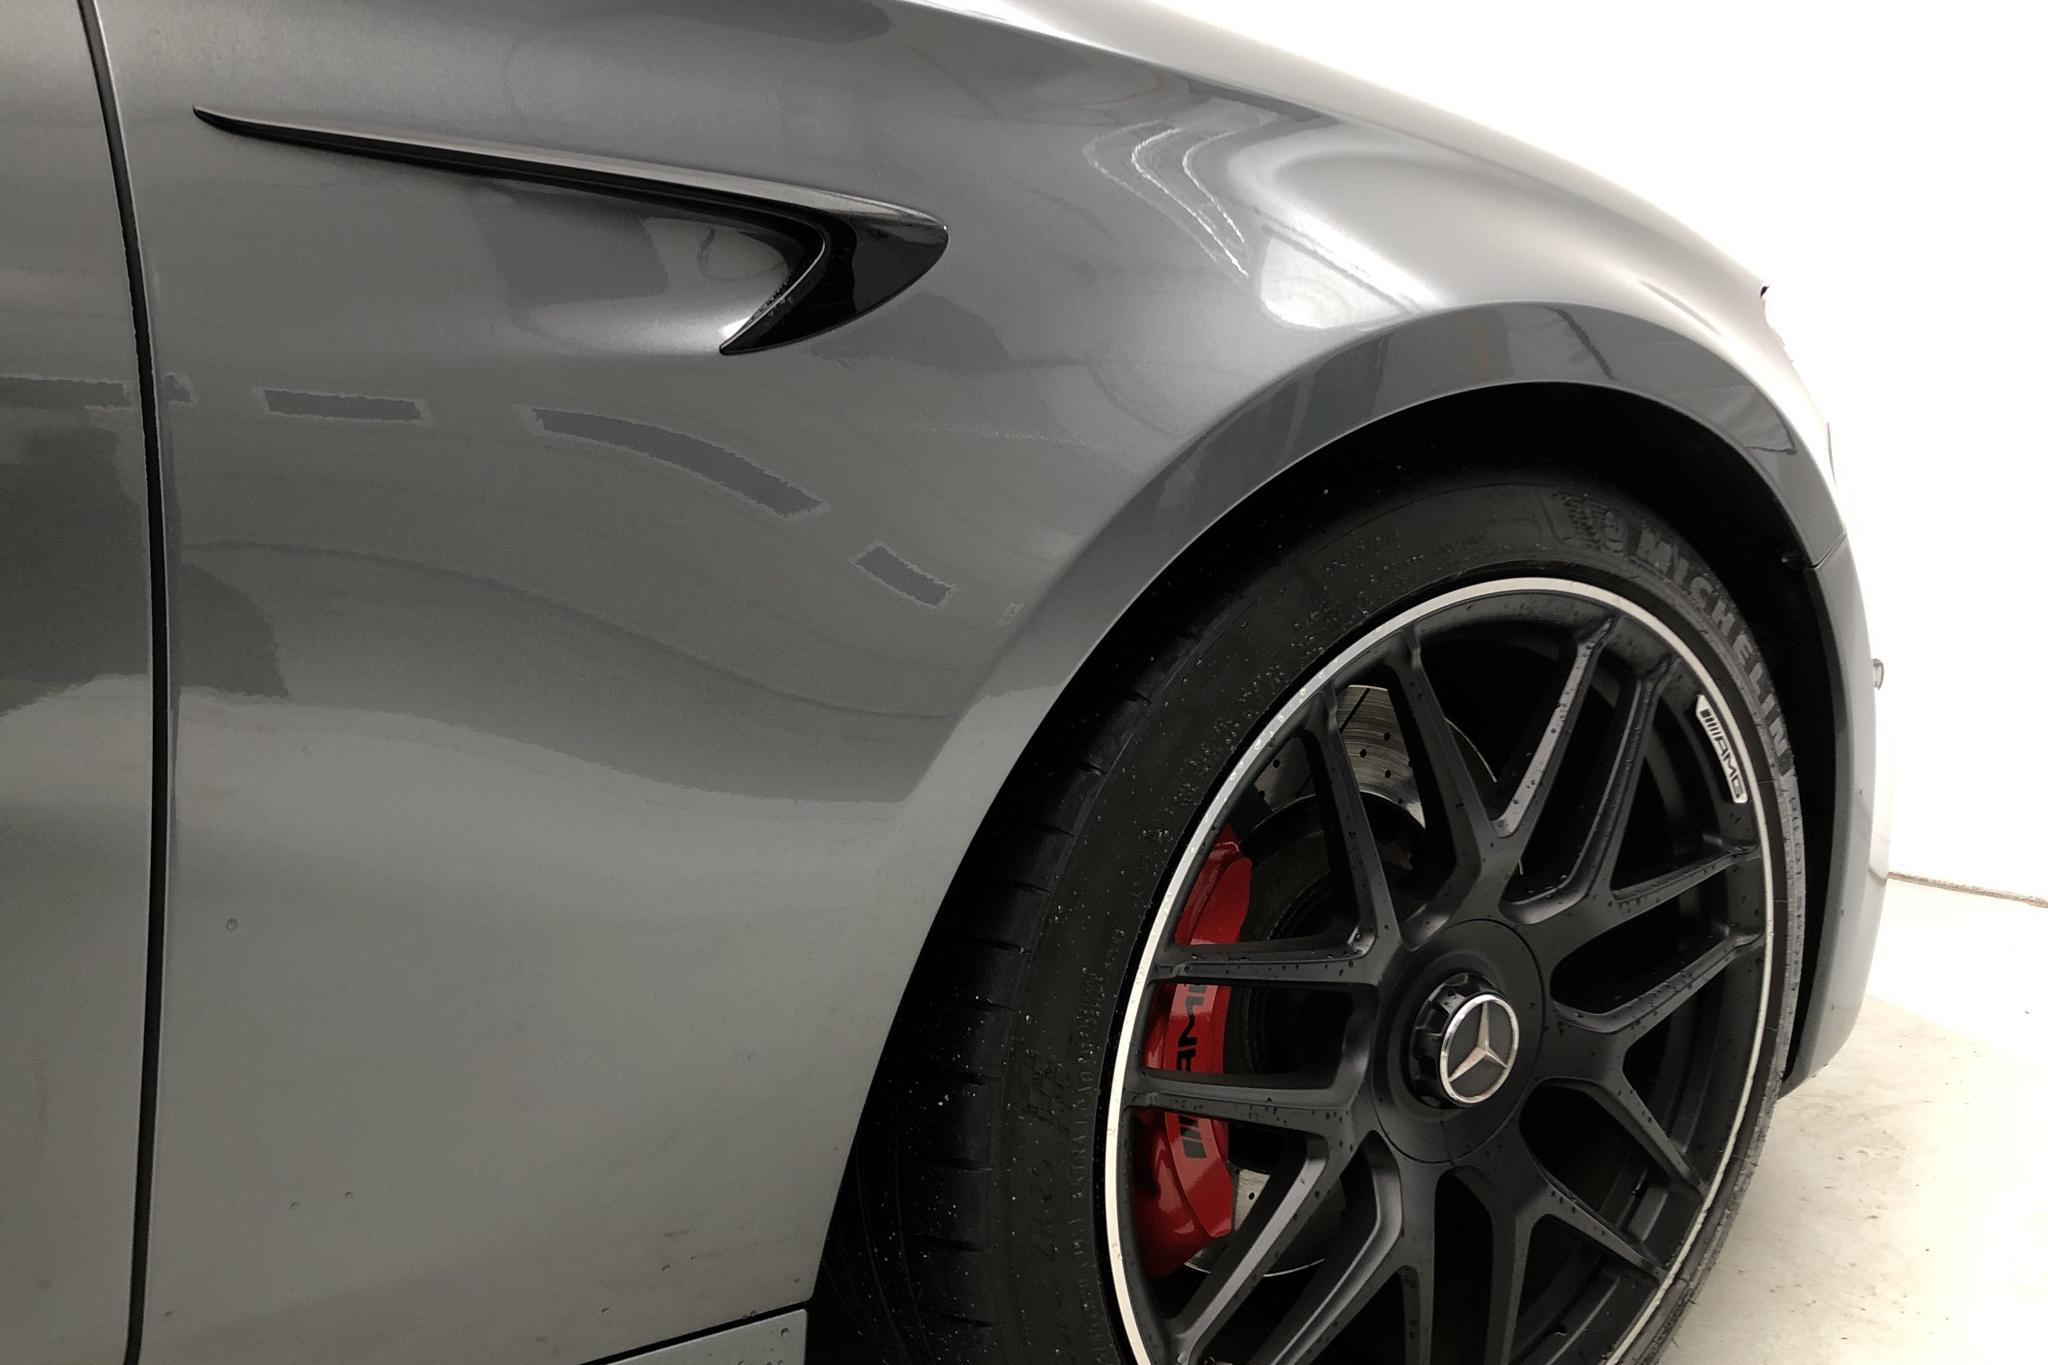 Mercedes E 63 S AMG 4MATIC Kombi S213 (612hk) - 3 563 mil - Automat - grå - 2019